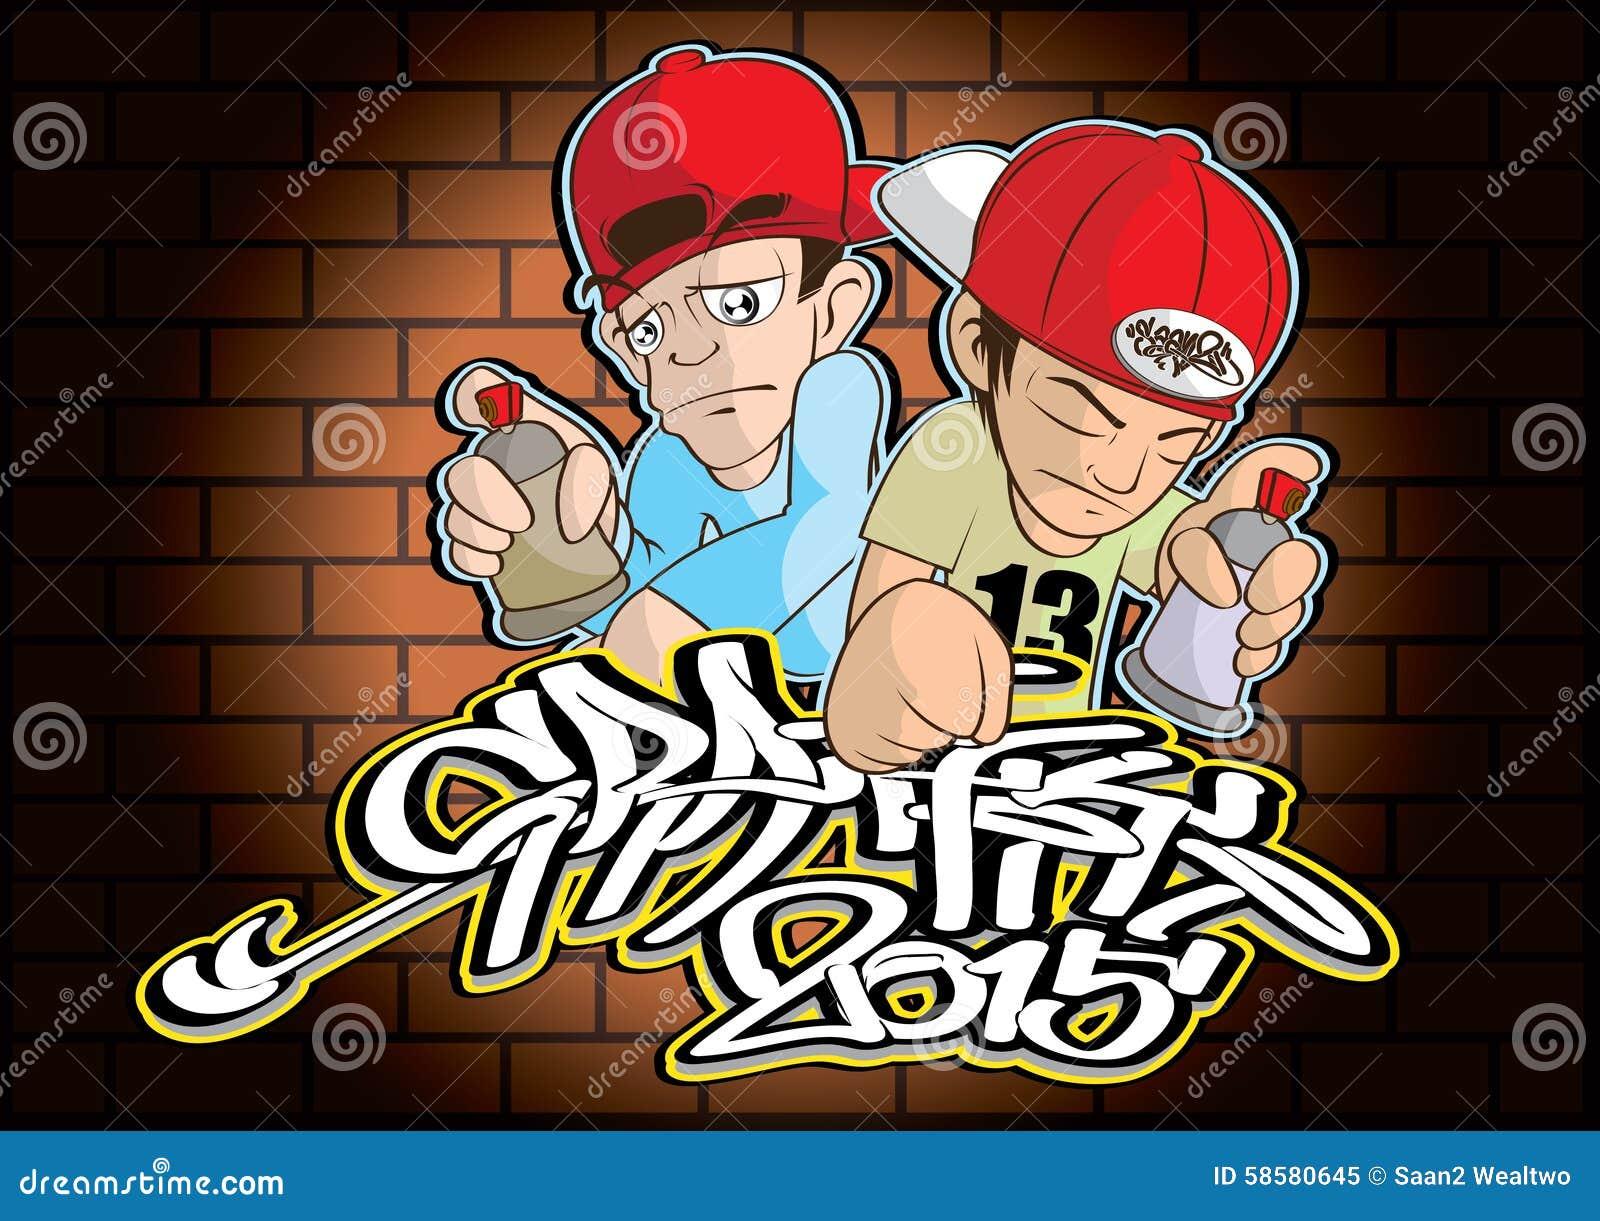 A Z Cartoon Characters Rap : Hip hop graffiti characters pixshark images